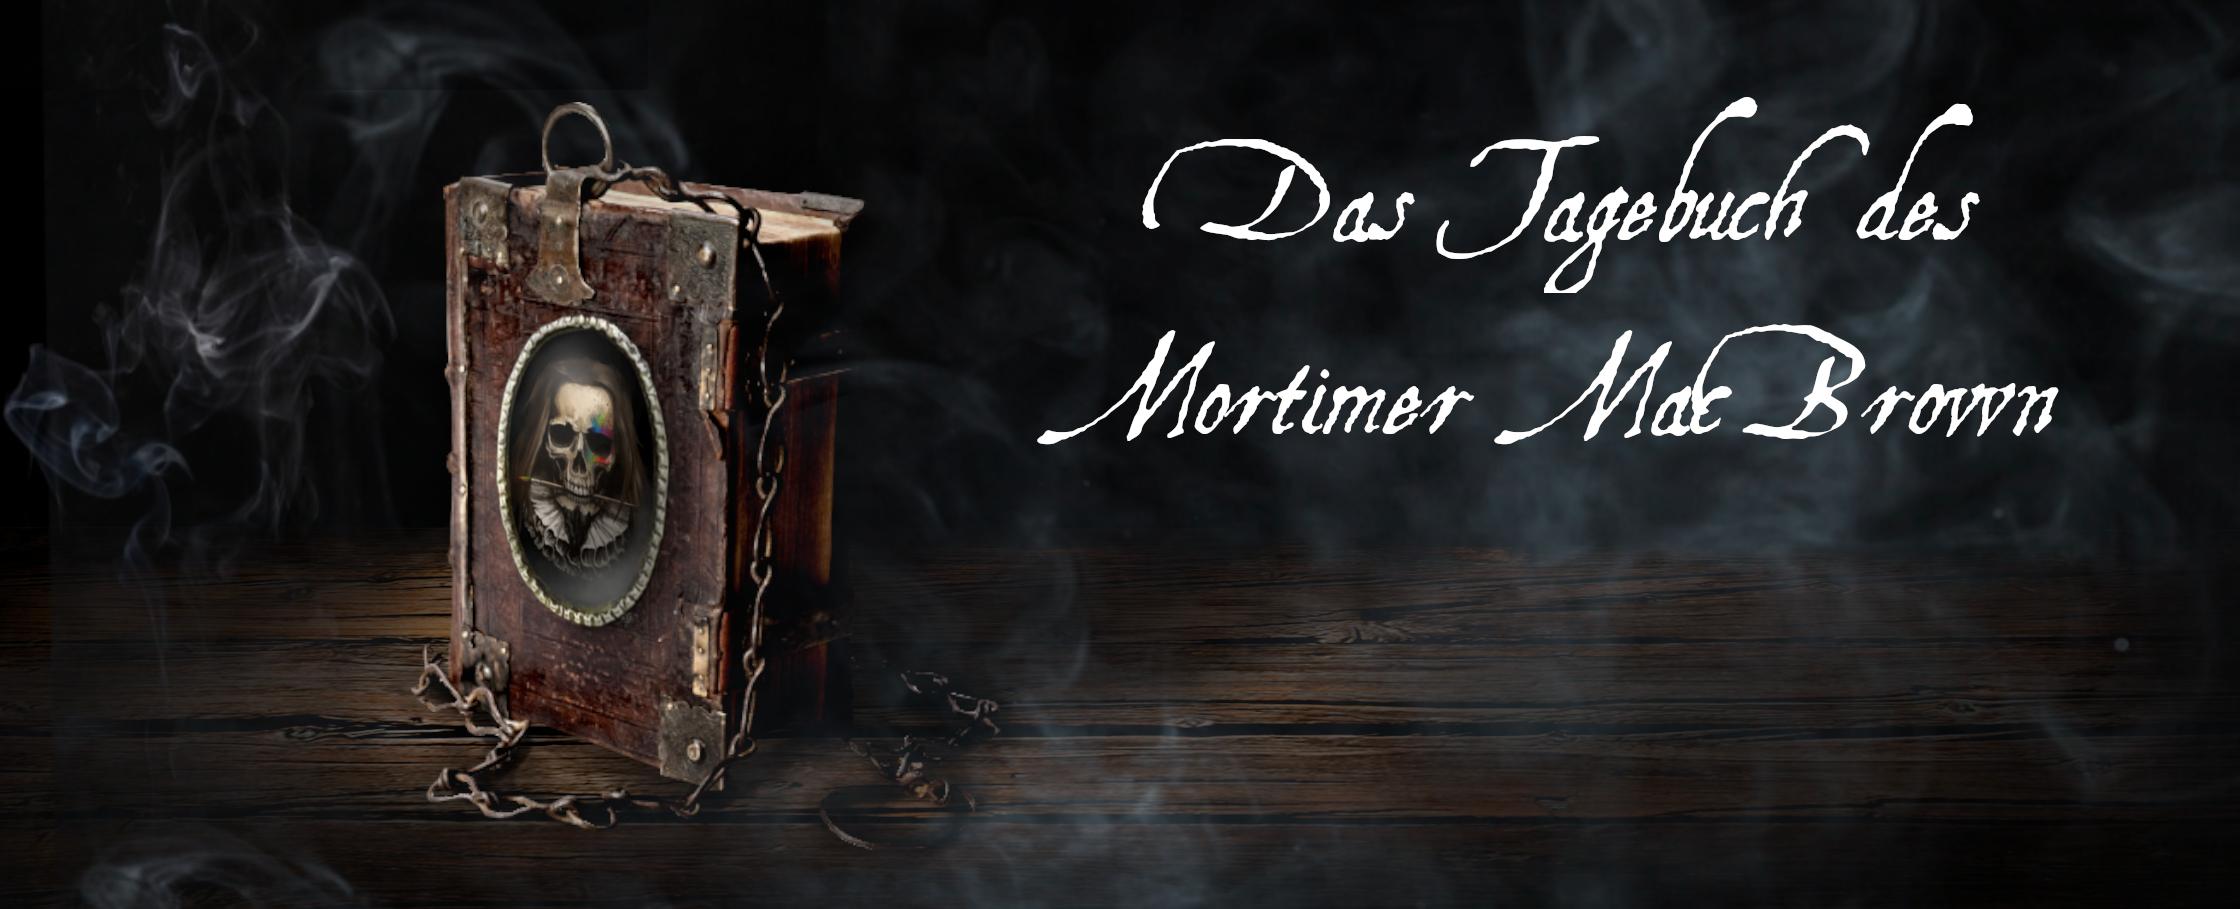 Das Tagebuch des Mortimer MacBrown